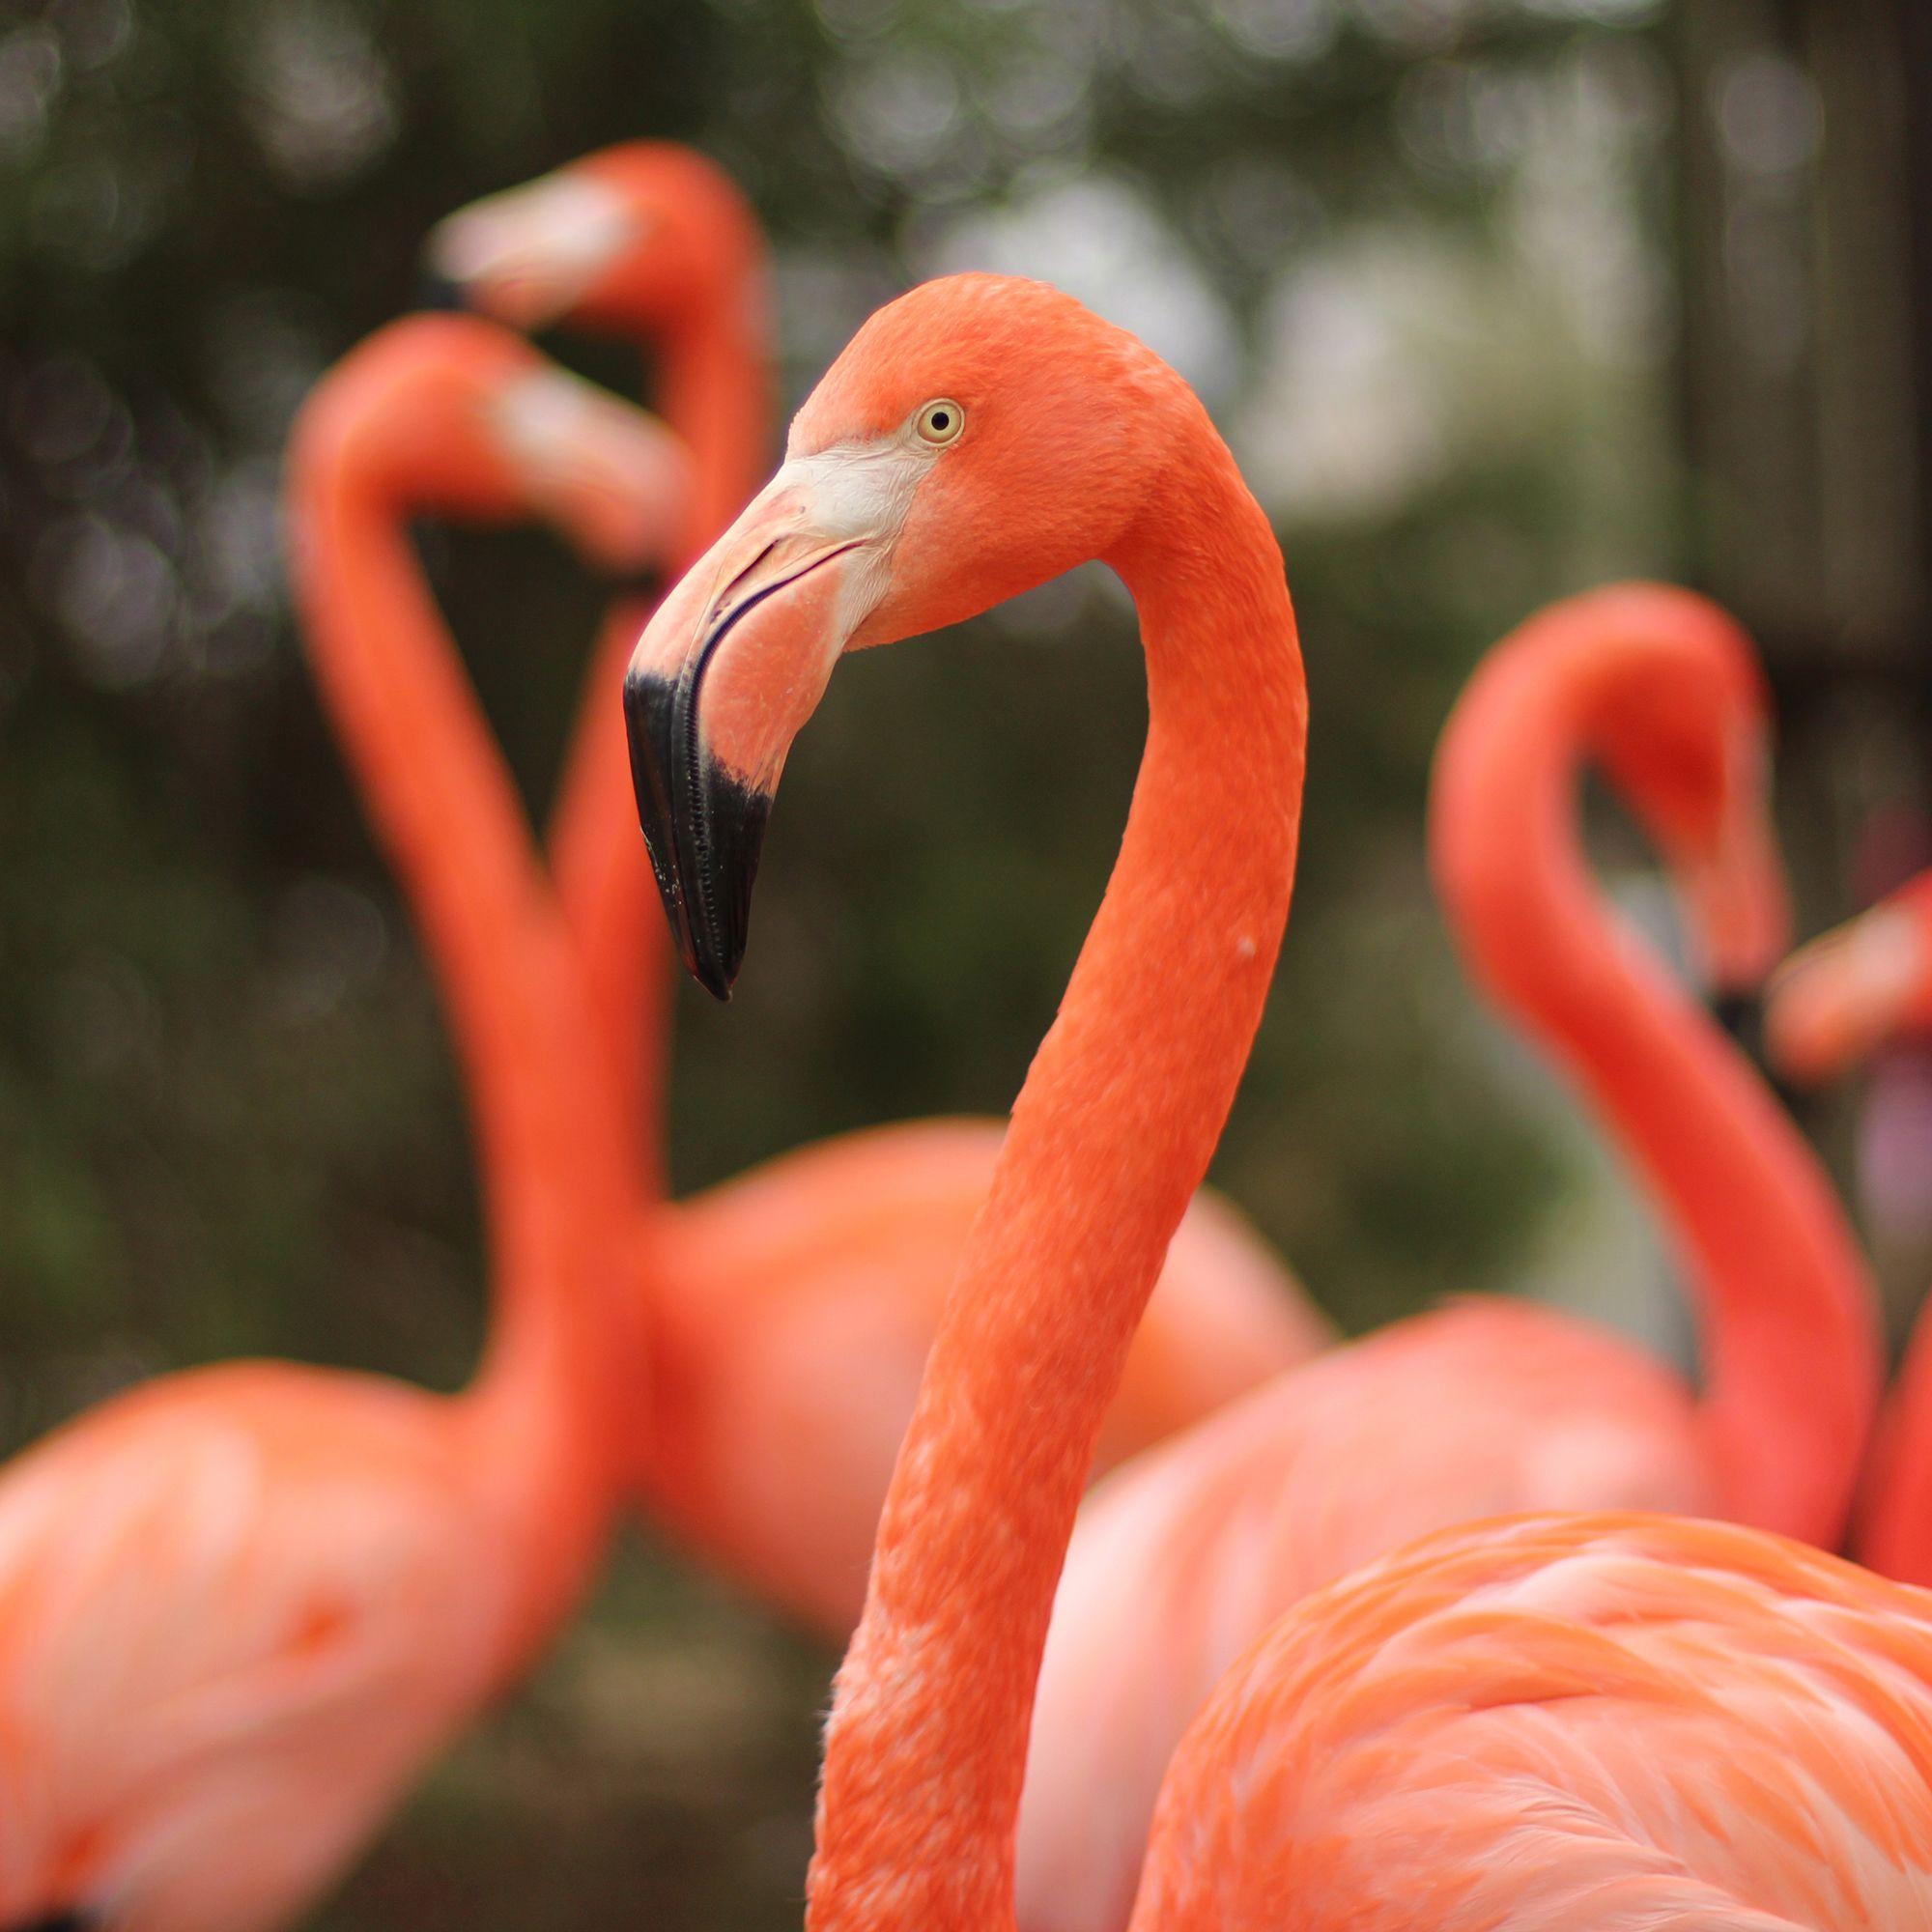 Tortuga the Flamingo